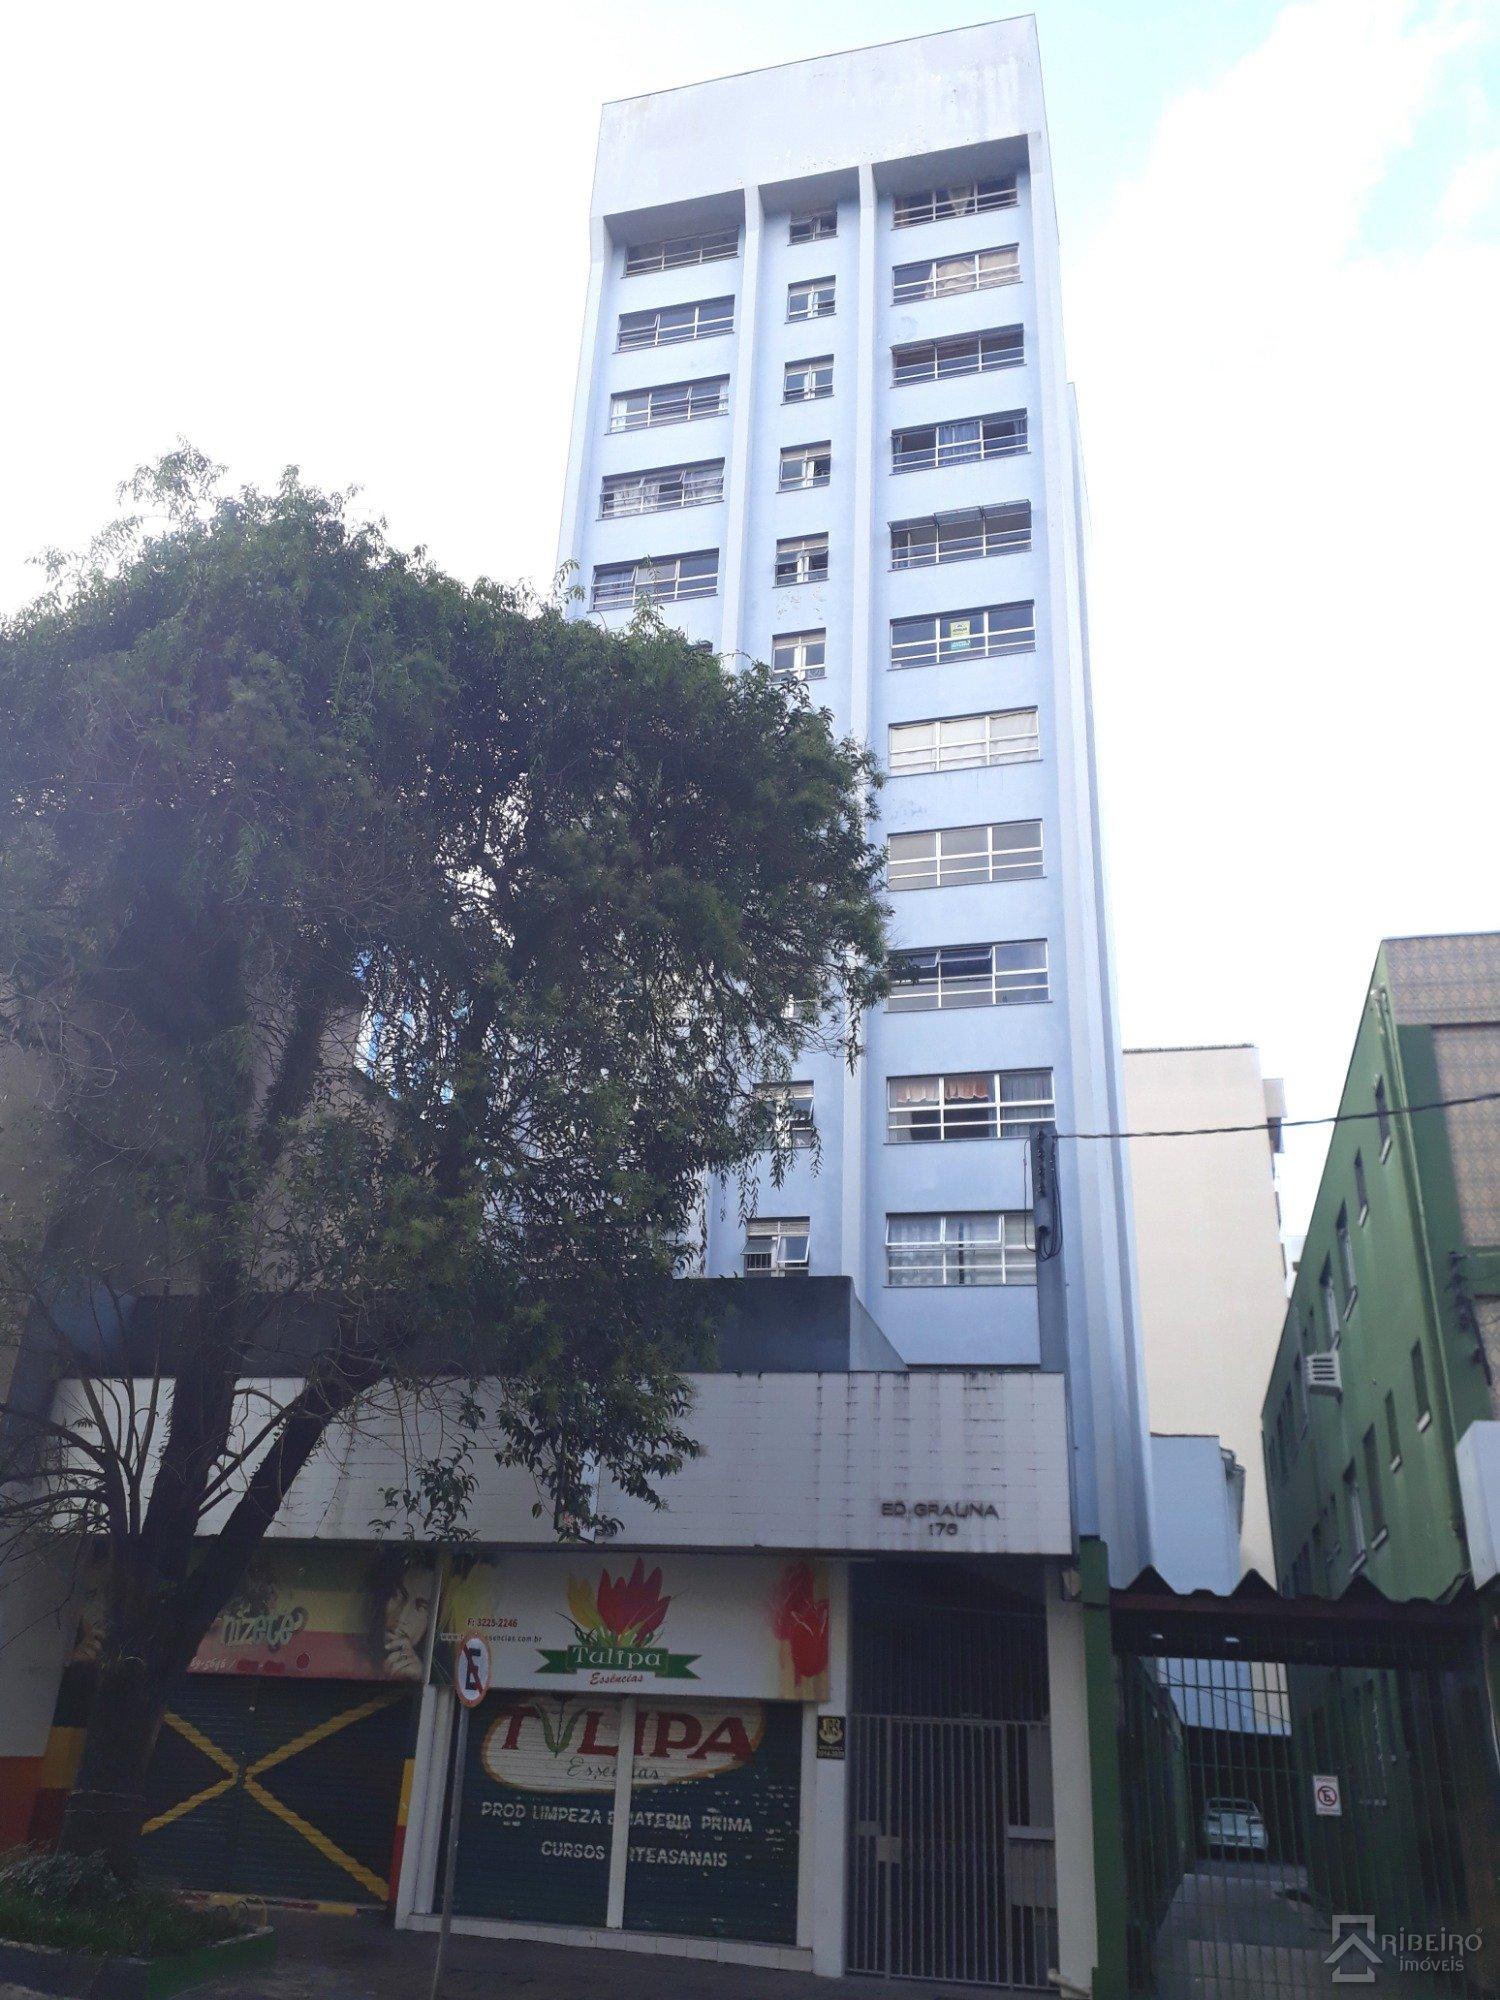 REF. 8091 - Curitiba - Rua  Nilo Cairo, 176 - Apto 12